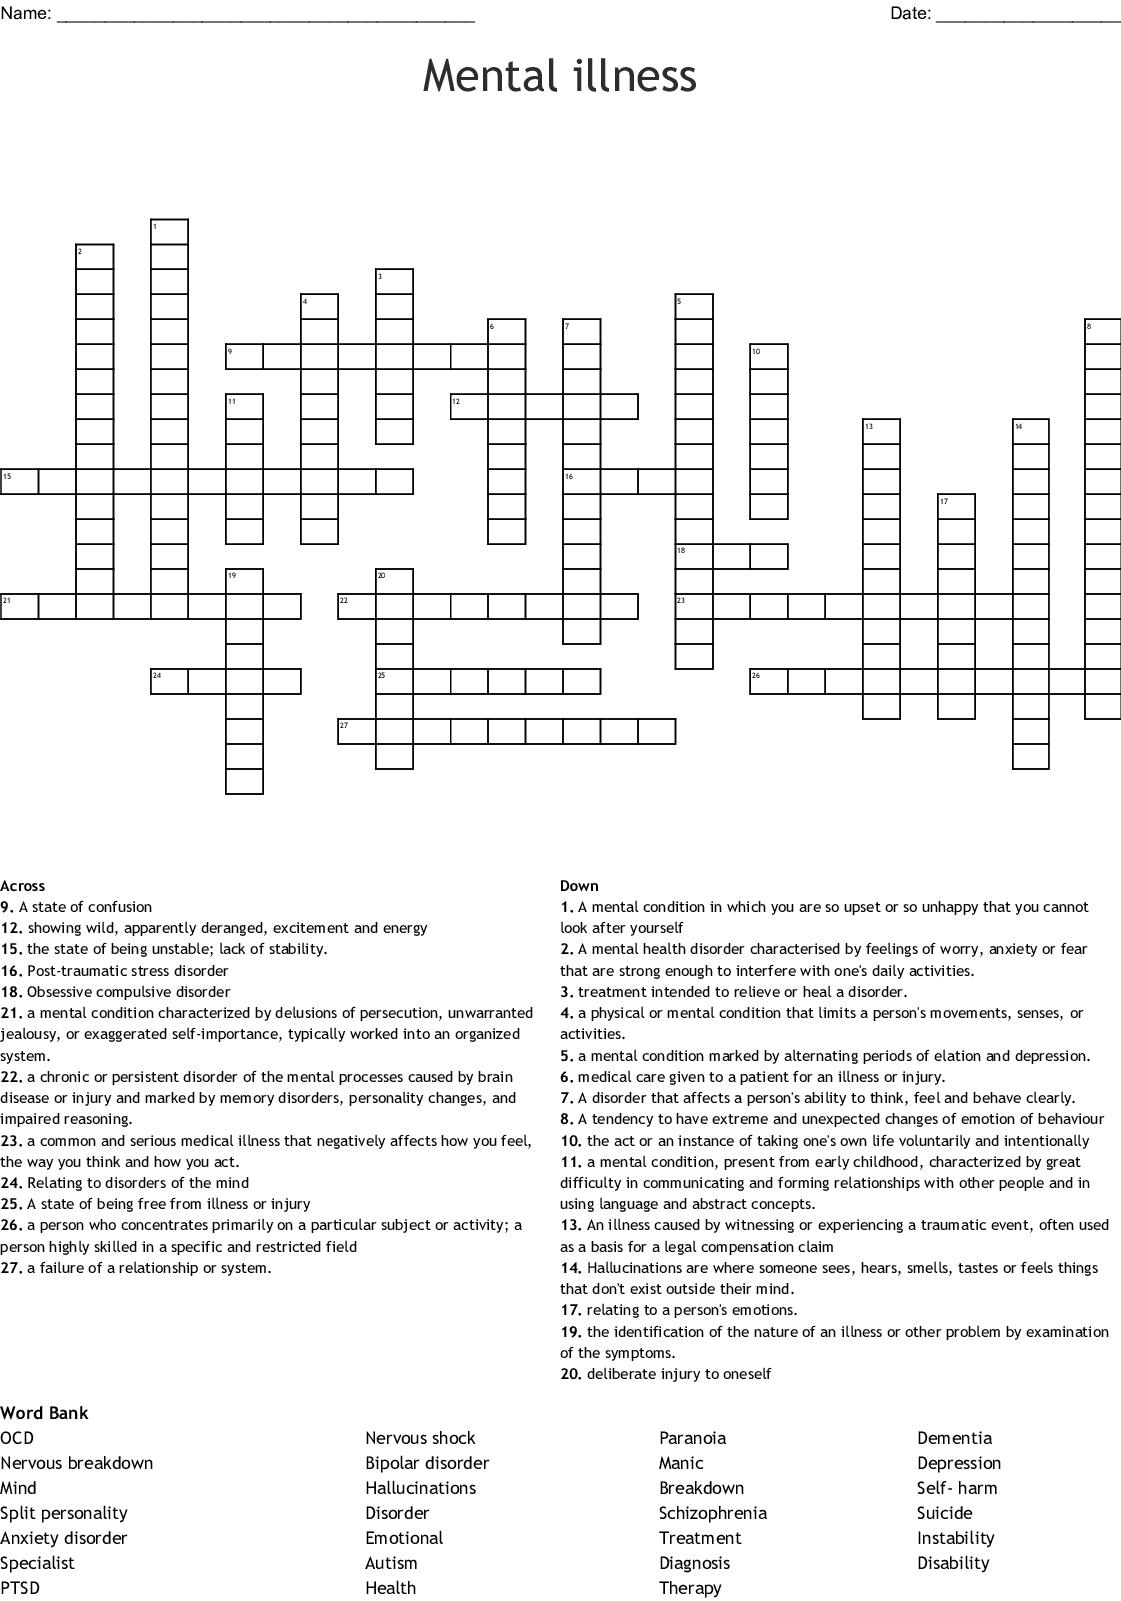 Mental Illness Crossword